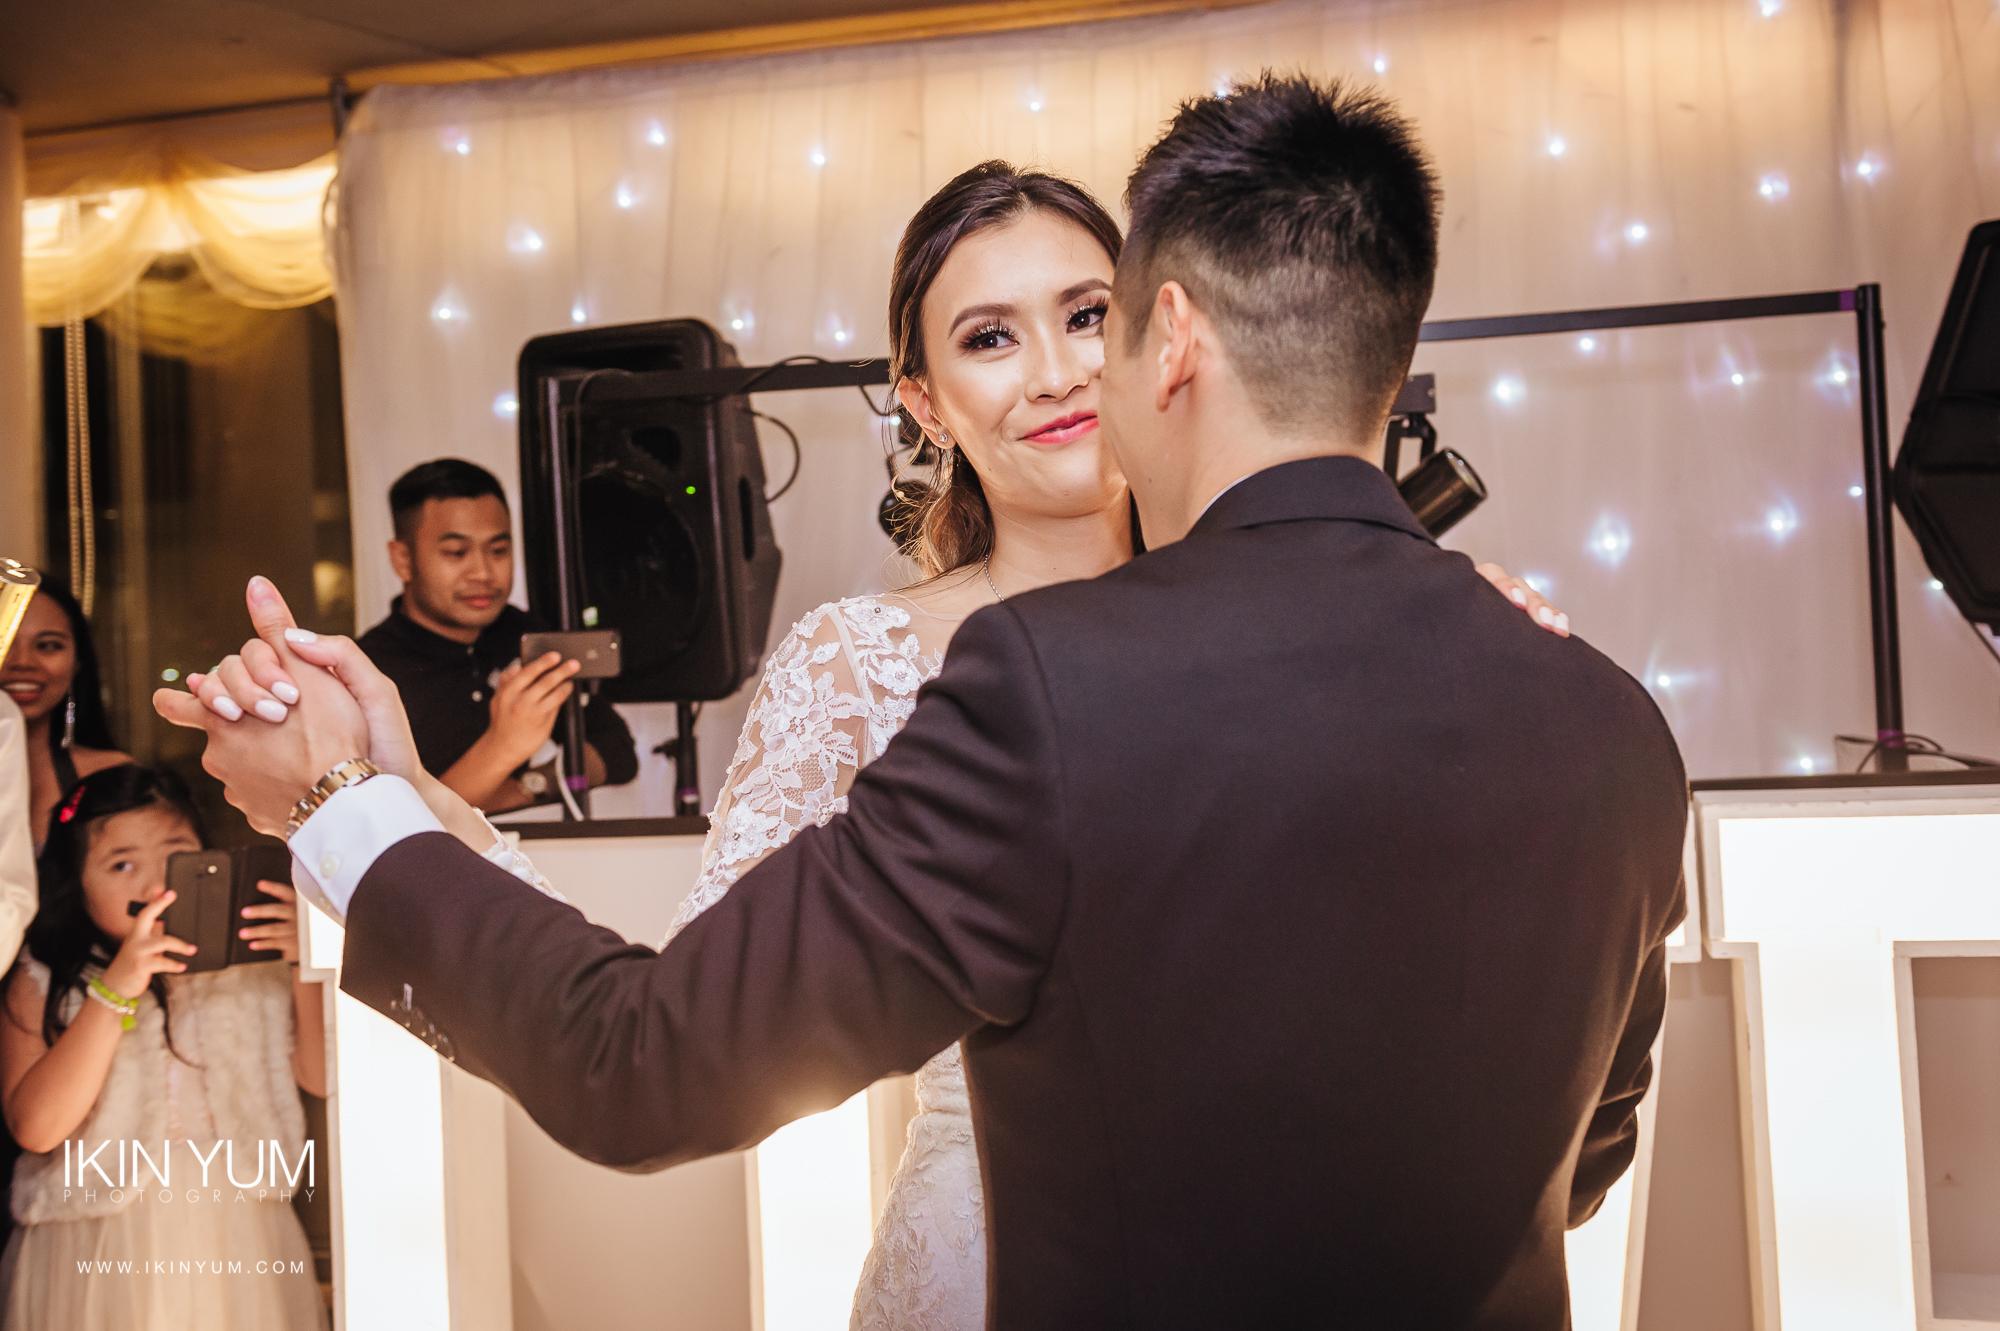 Syon Park Wedding - Ikin Yum Photography -140.jpg